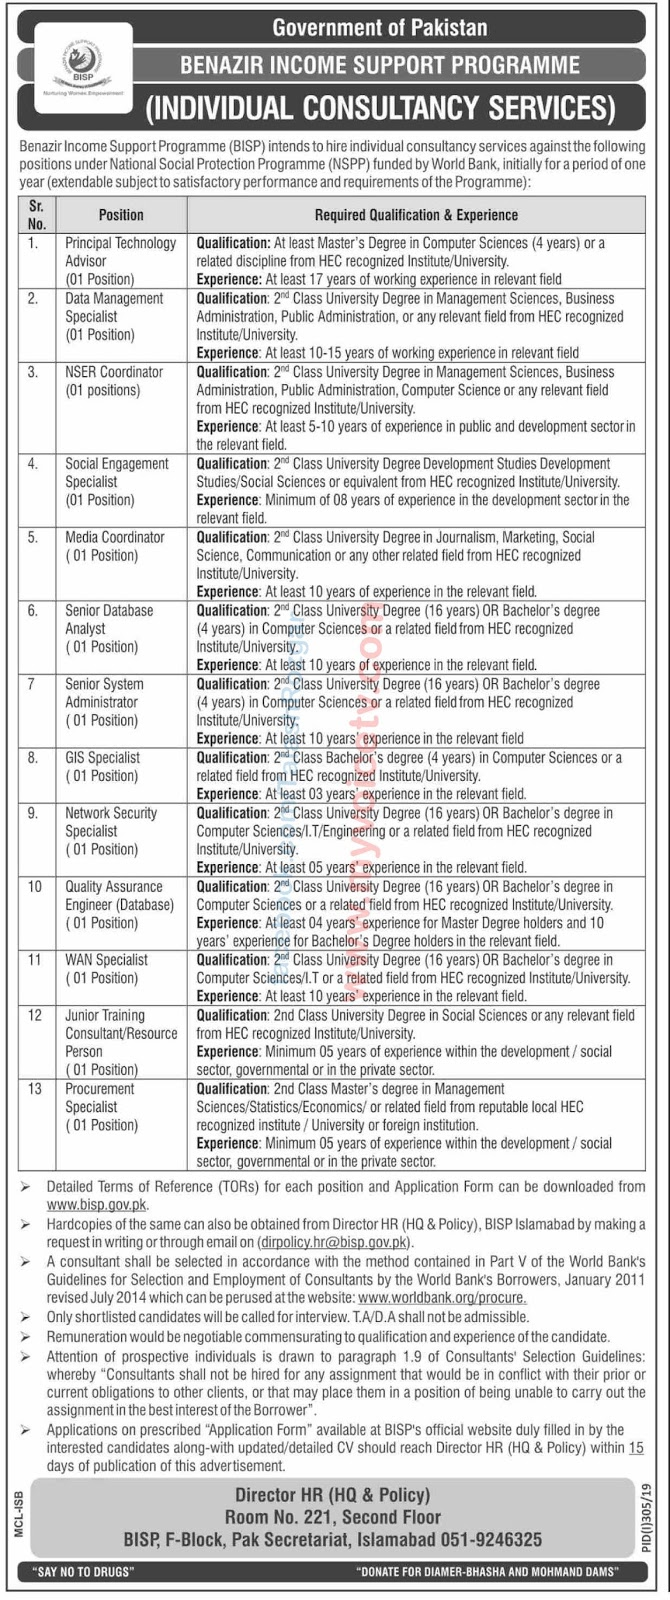 ➨ #Jobs - #Career_Opportunities - #Jobs - at Benazir Income Support Programme, Govt of Pakistan (13 Posts ) Last date 29 July 2019